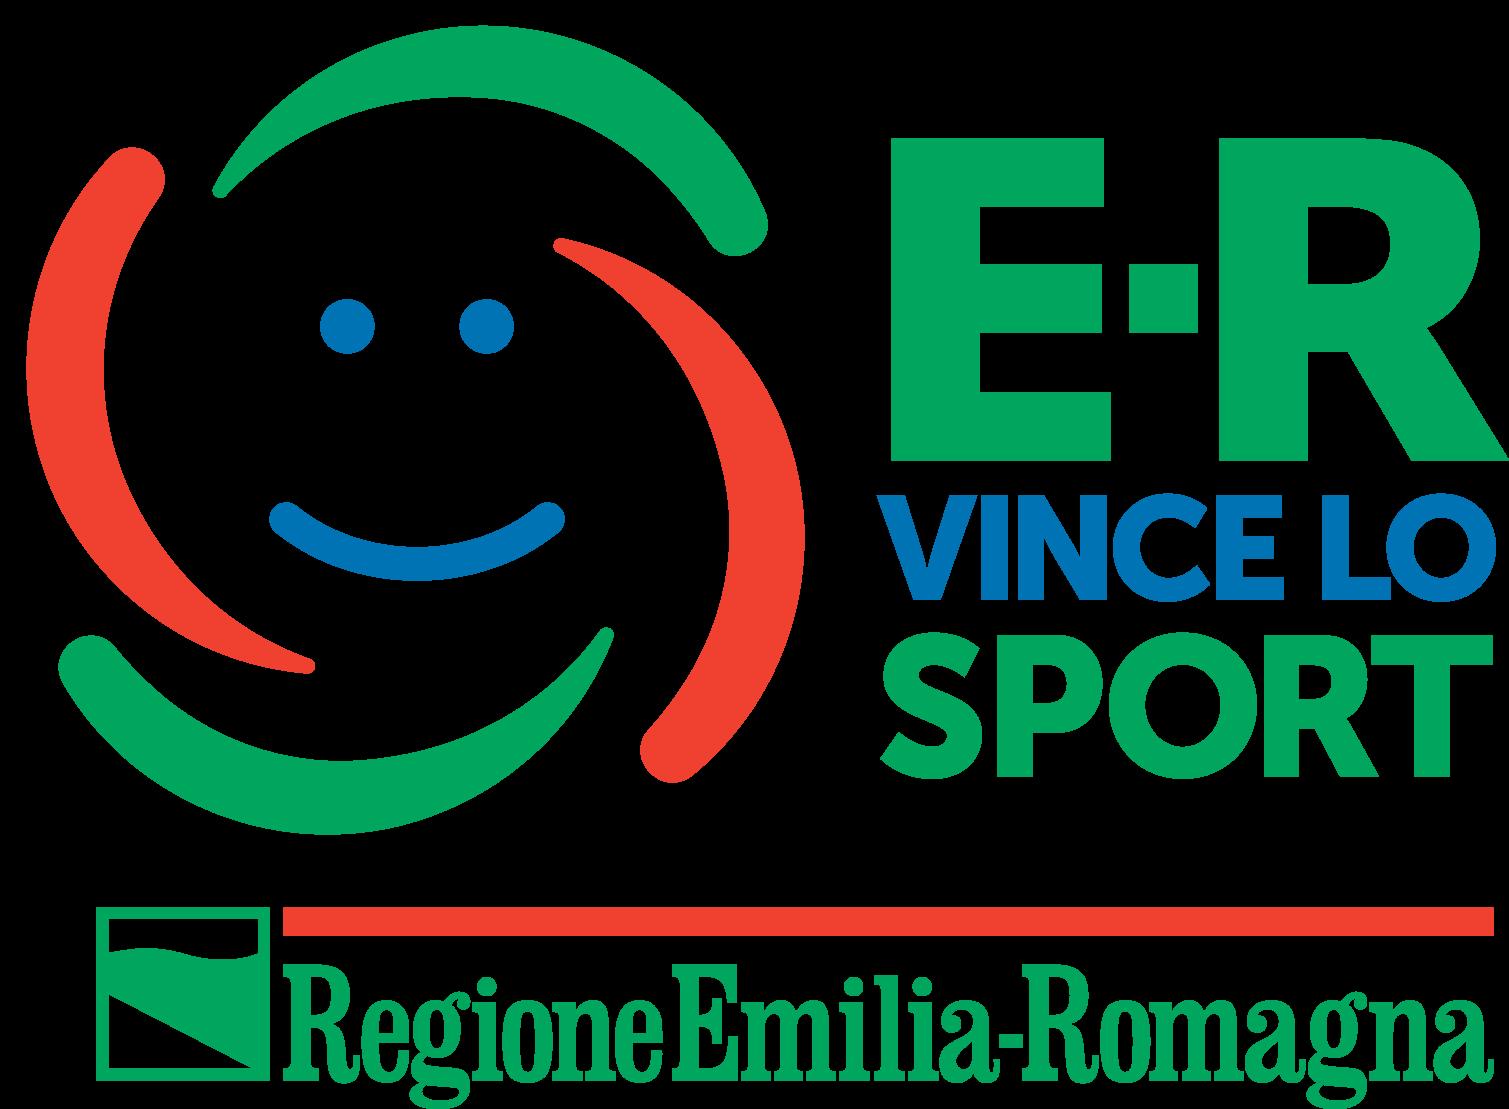 logo-ER-vince-lo-Sport-orizz_3colori